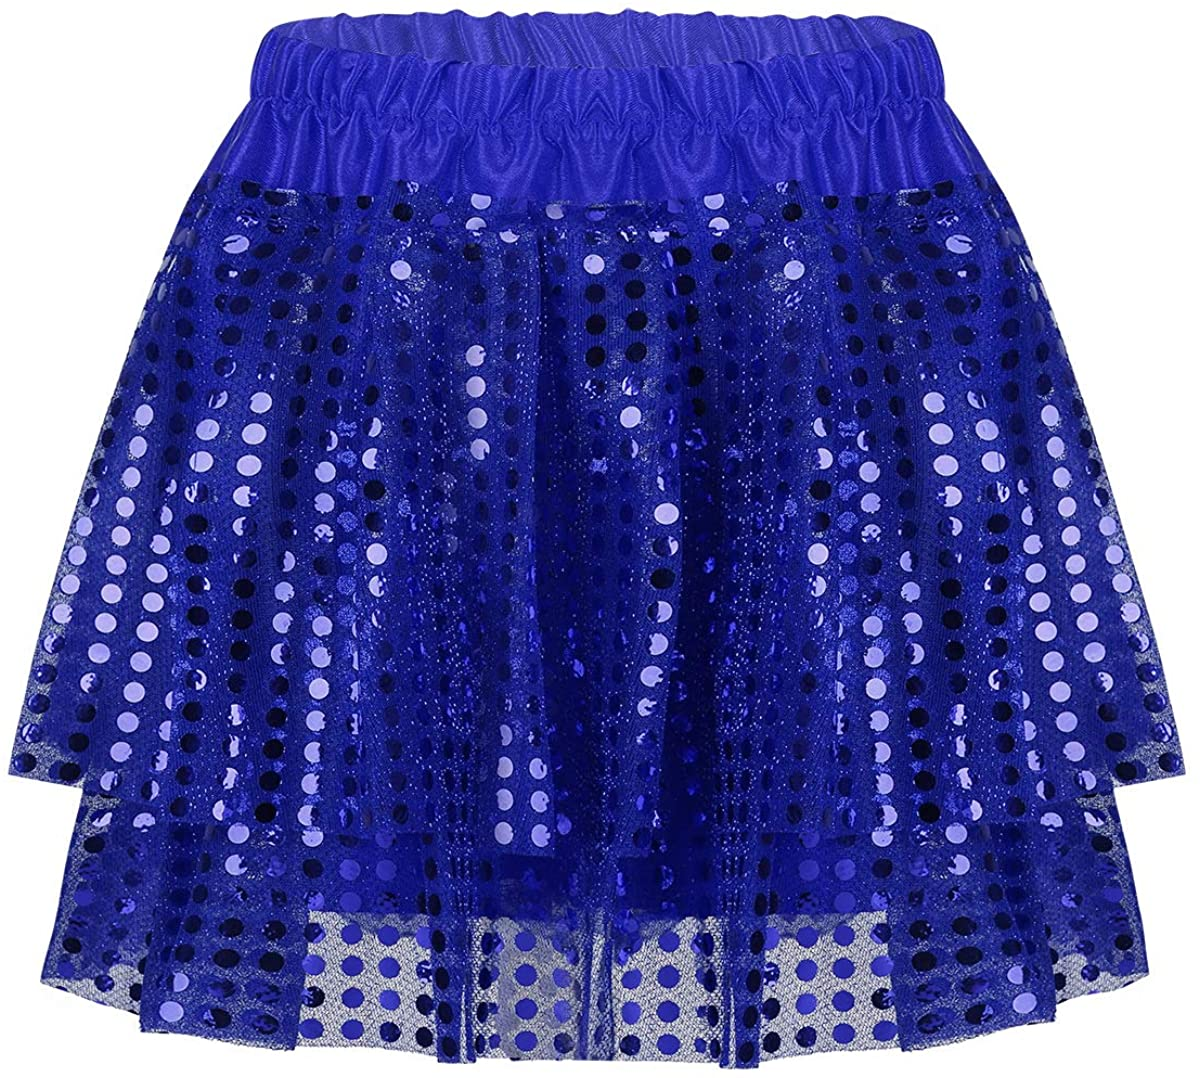 MSemis Kids Girls Sequins Hip-Hop Modern Jazz Performing Costume Ruffles Mini Skirts with Elastic Waistband